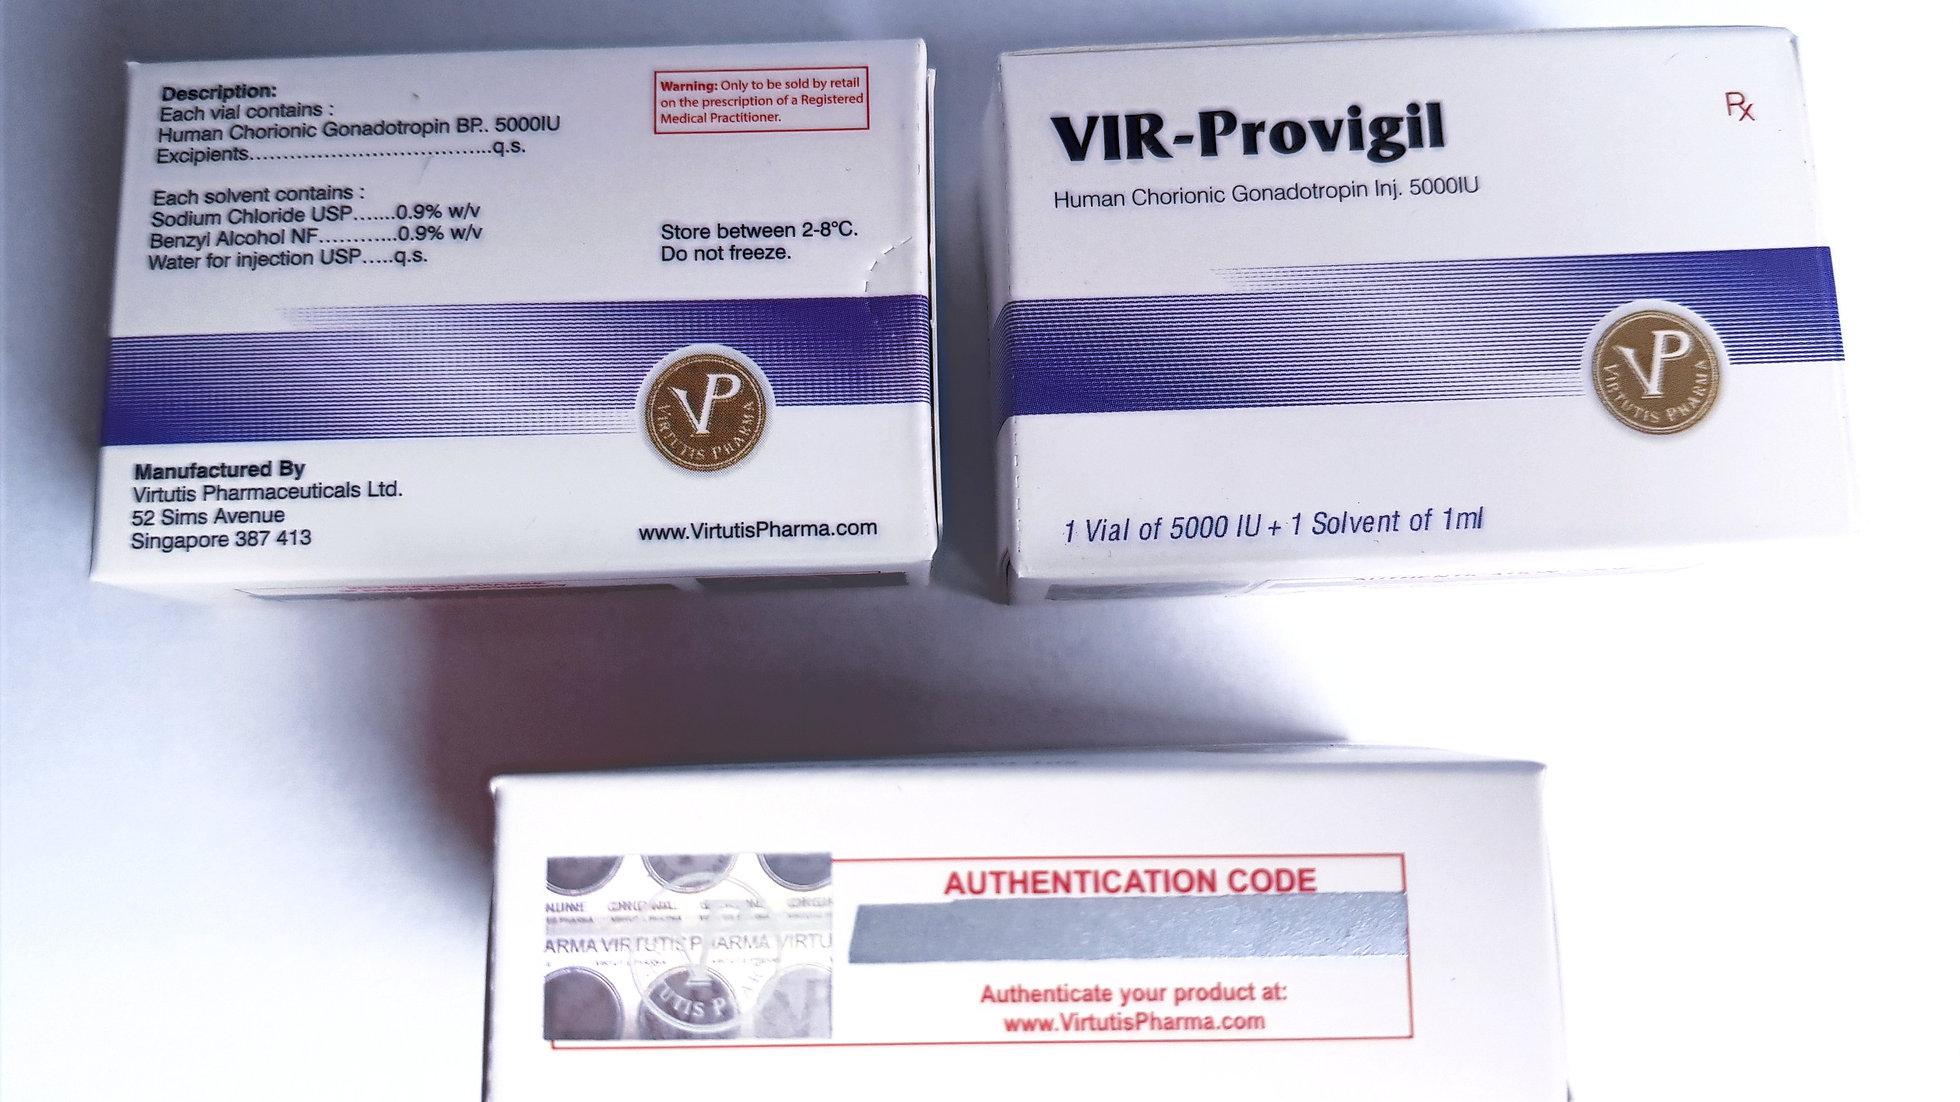 HCG 5000IU-PREGNYL TESTOSTERONE PRODIGY